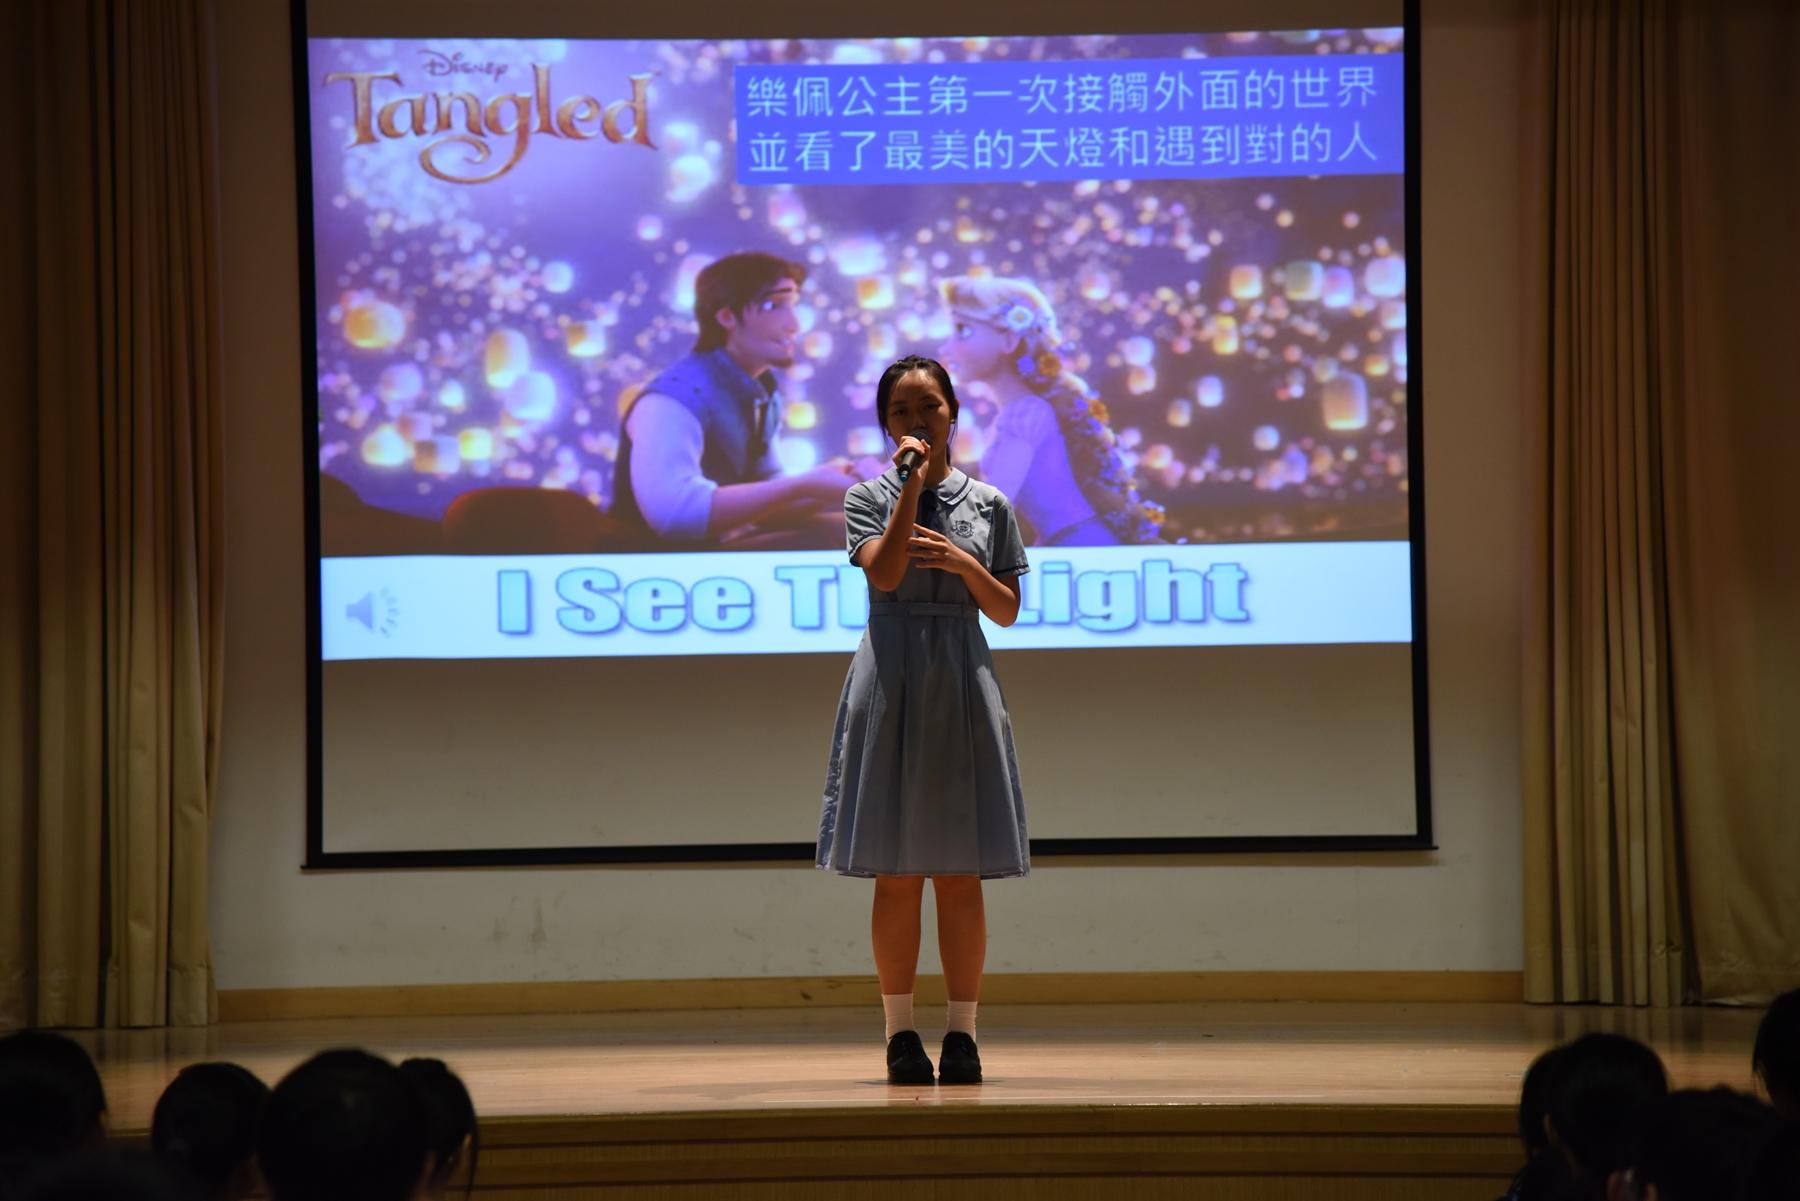 http://npc.edu.hk/sites/default/files/dsc_0197_2.jpg